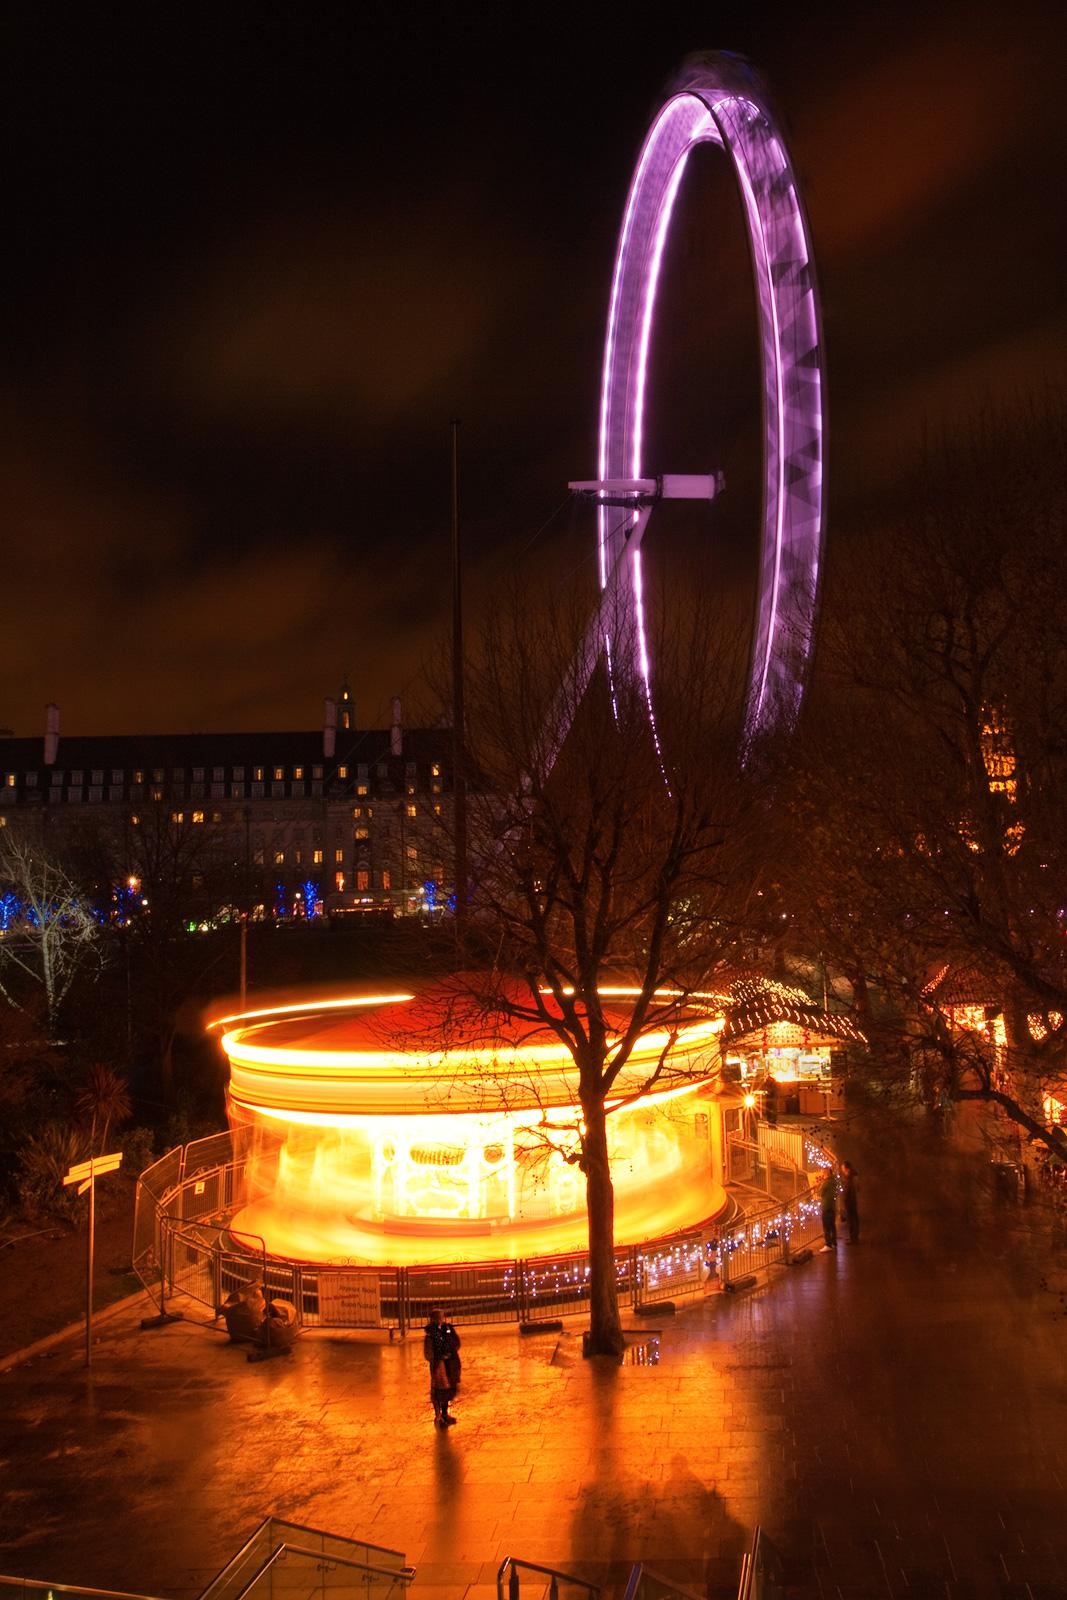 britain,city scape,cityscape,england,europe,eye,fast,ferris wheel,intense,intensity,london,london eye,long exposure,motion,, photo